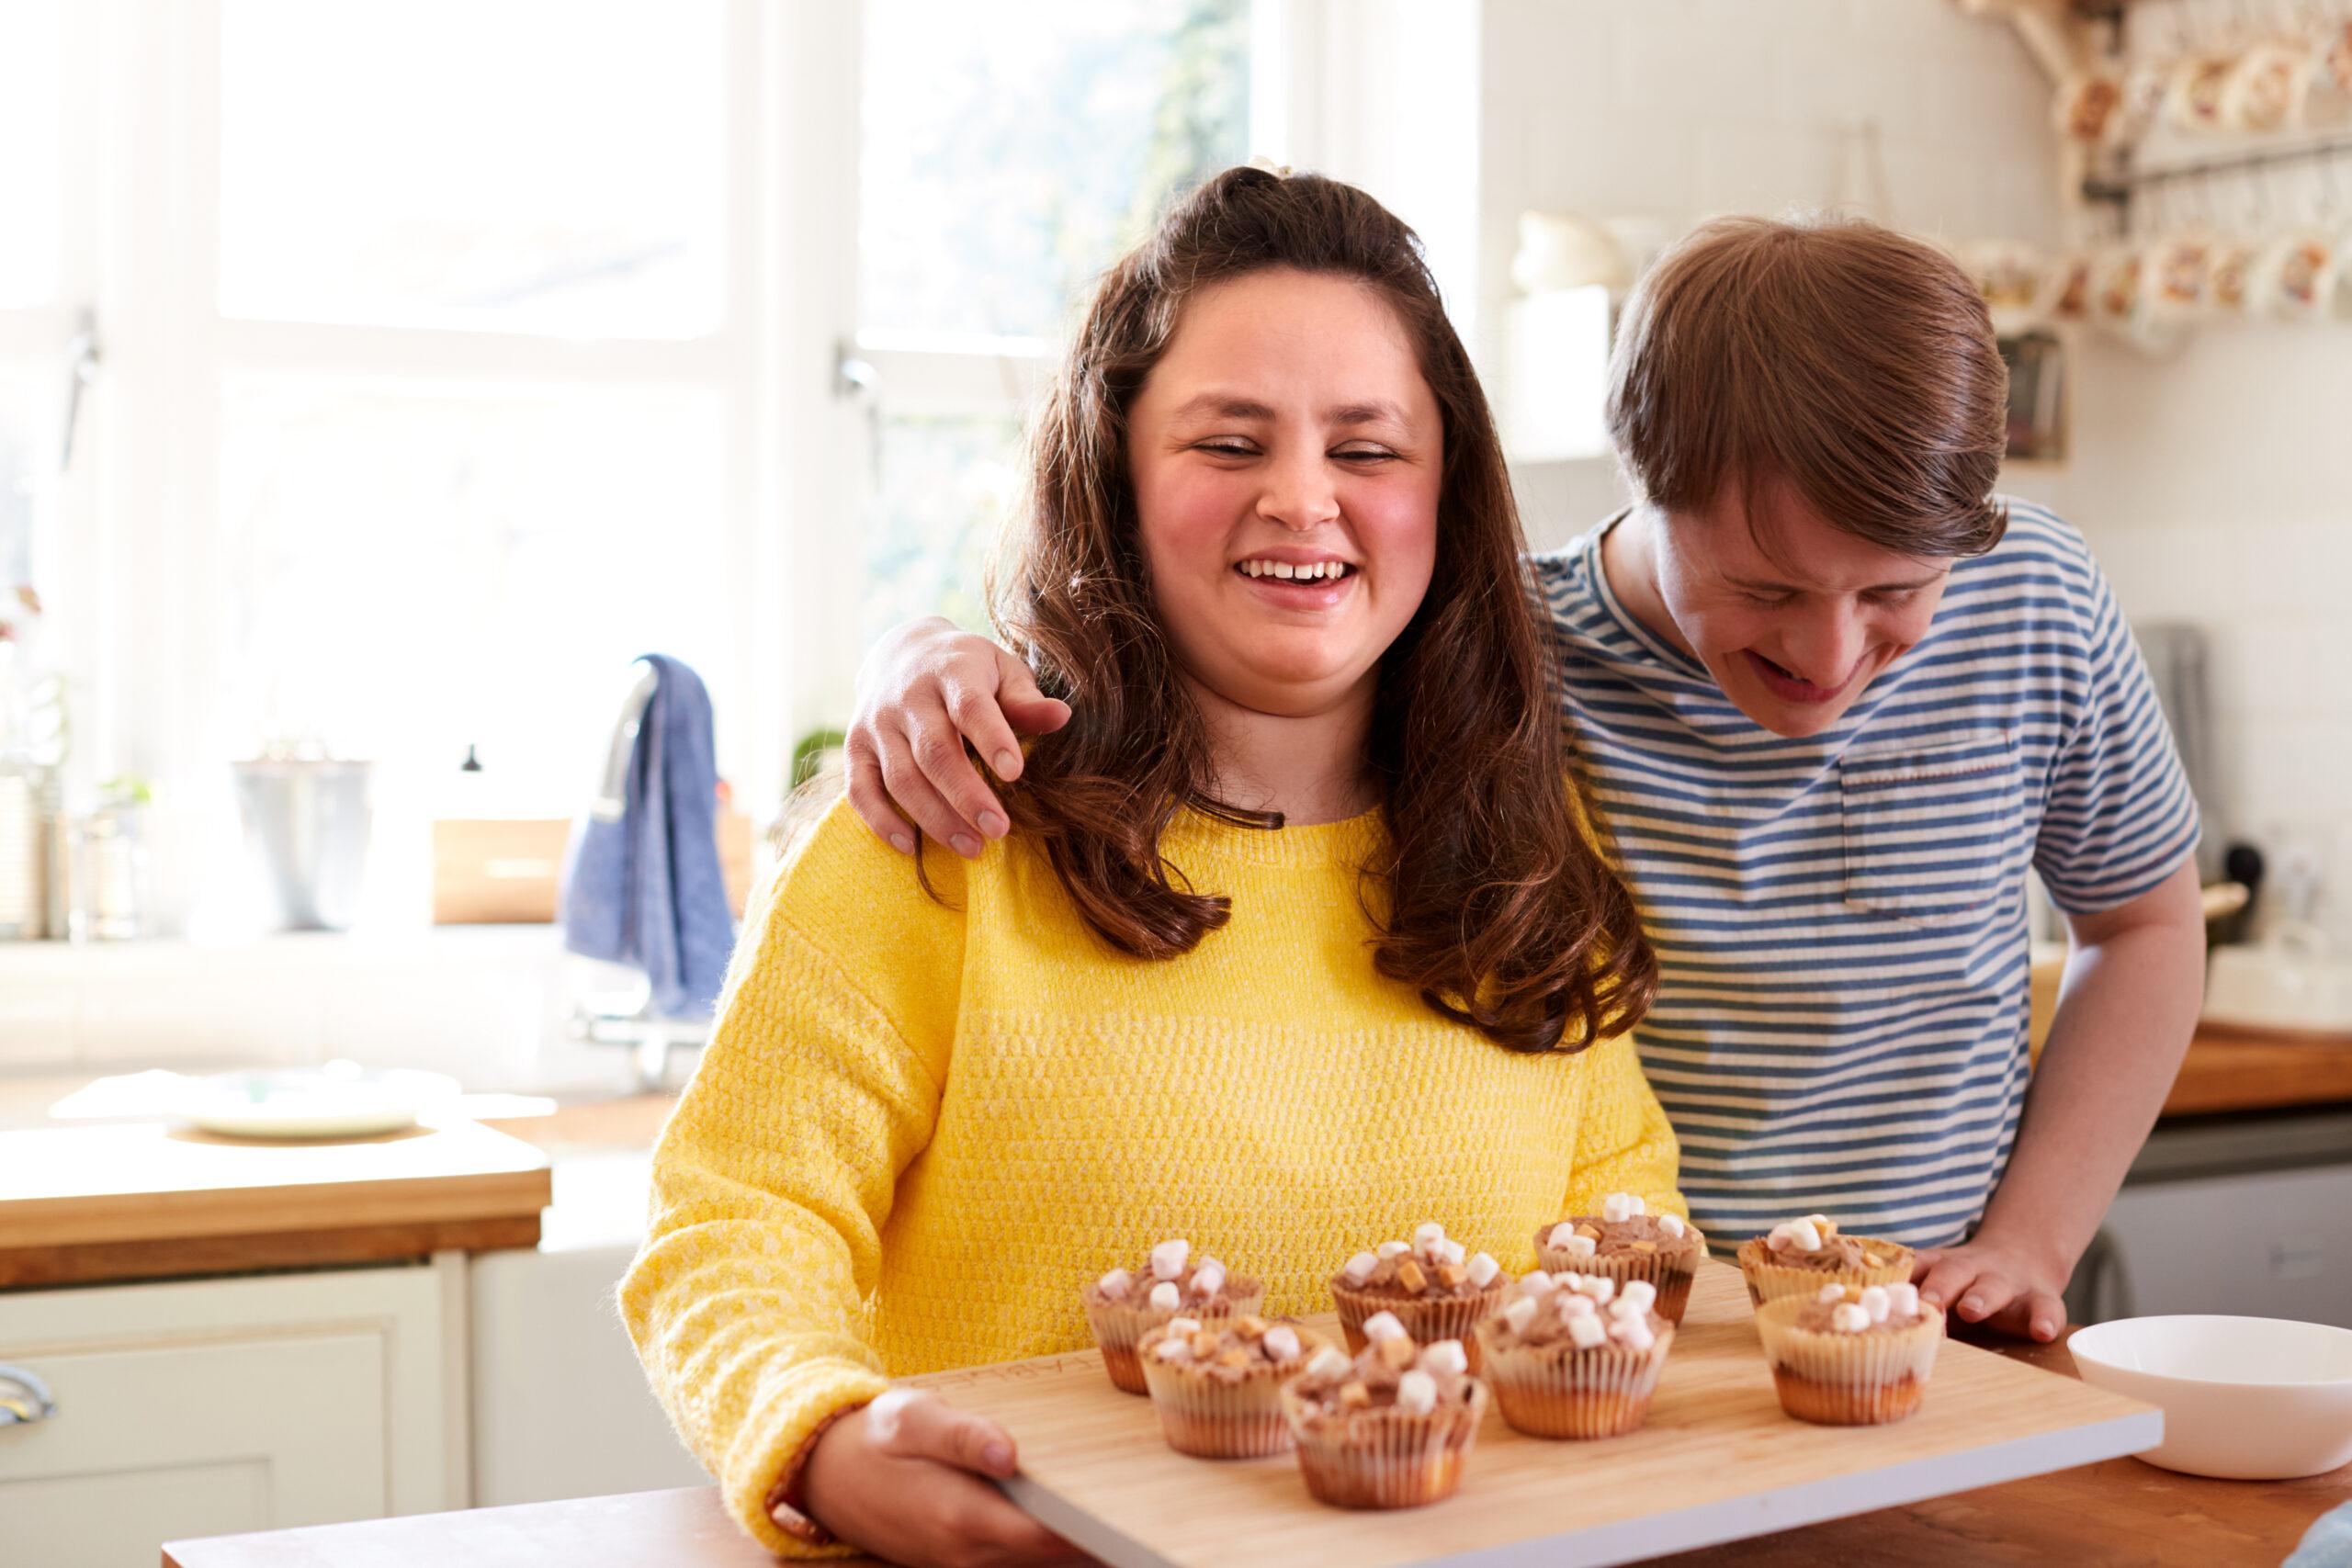 couple-baking-muffins-in-their-kitchen